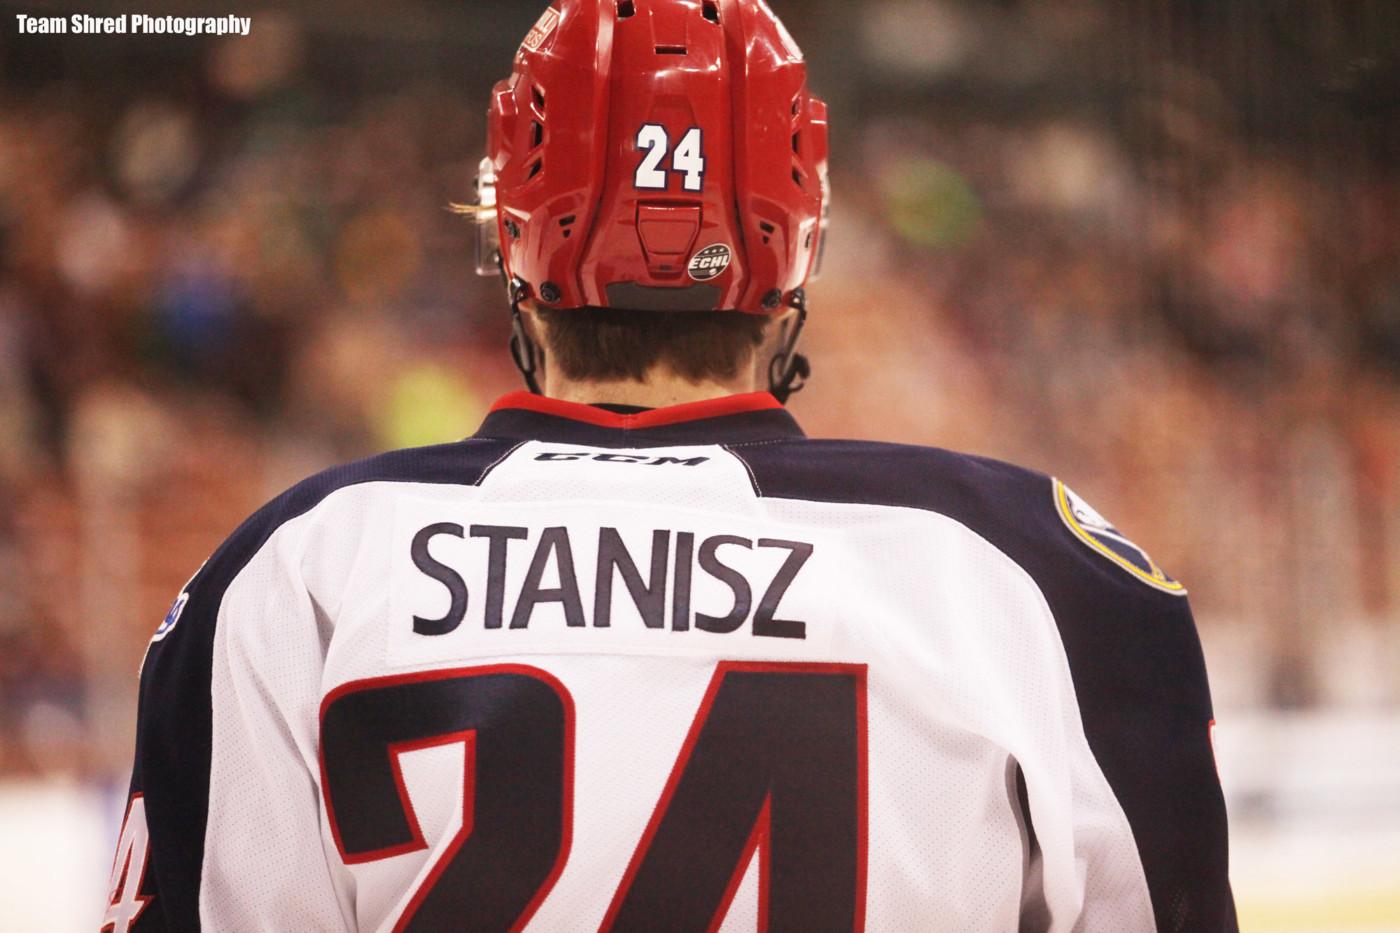 Matt-Stanisz